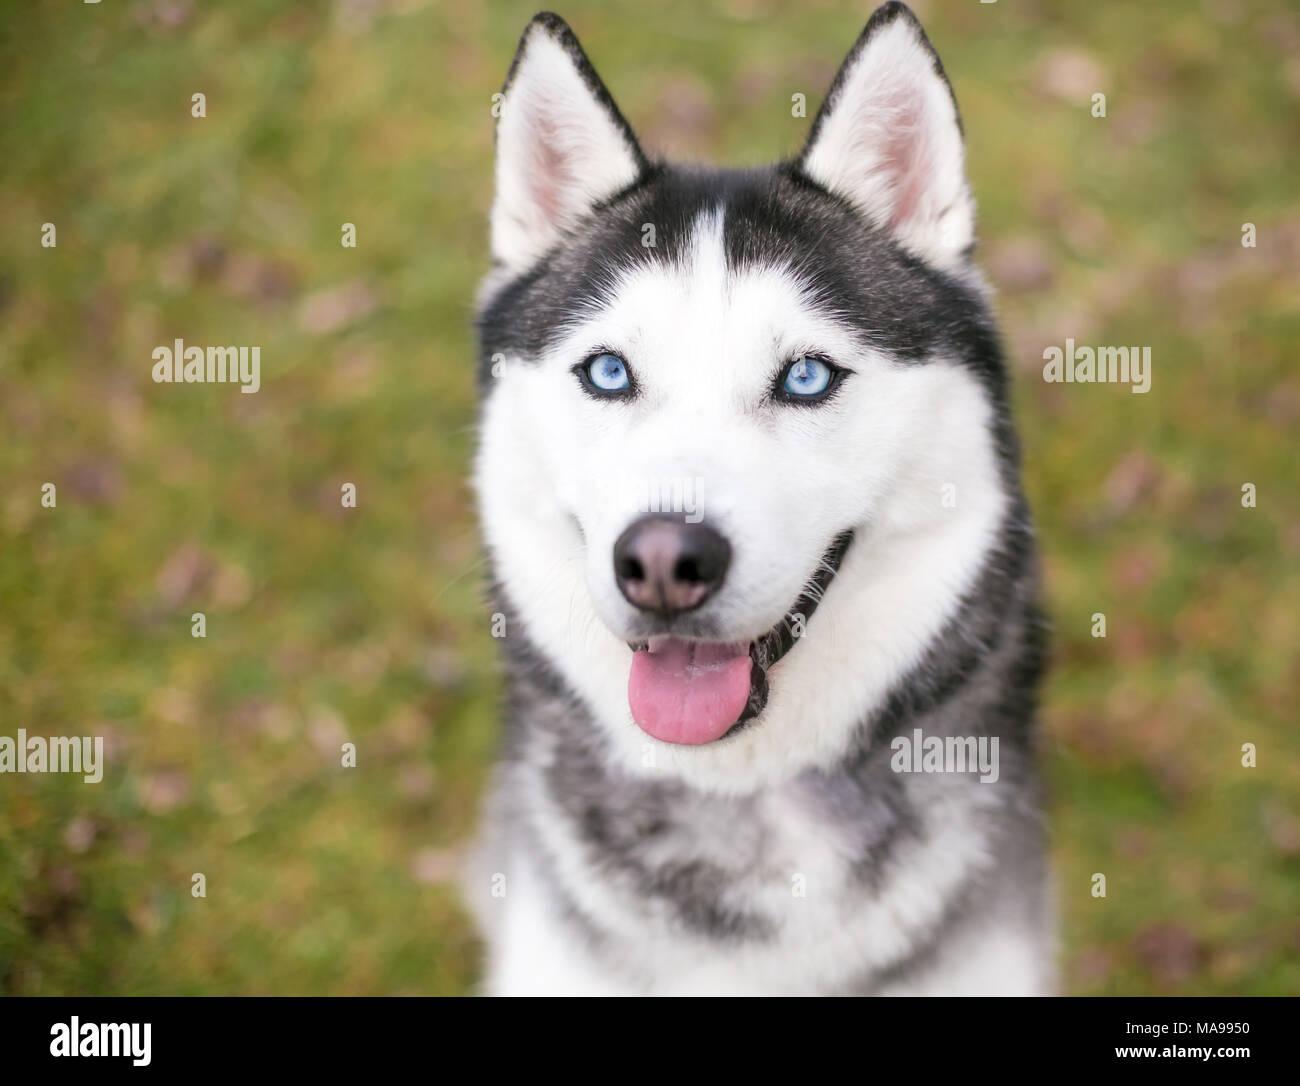 A Siberian Husky dog outdoors - Stock Image